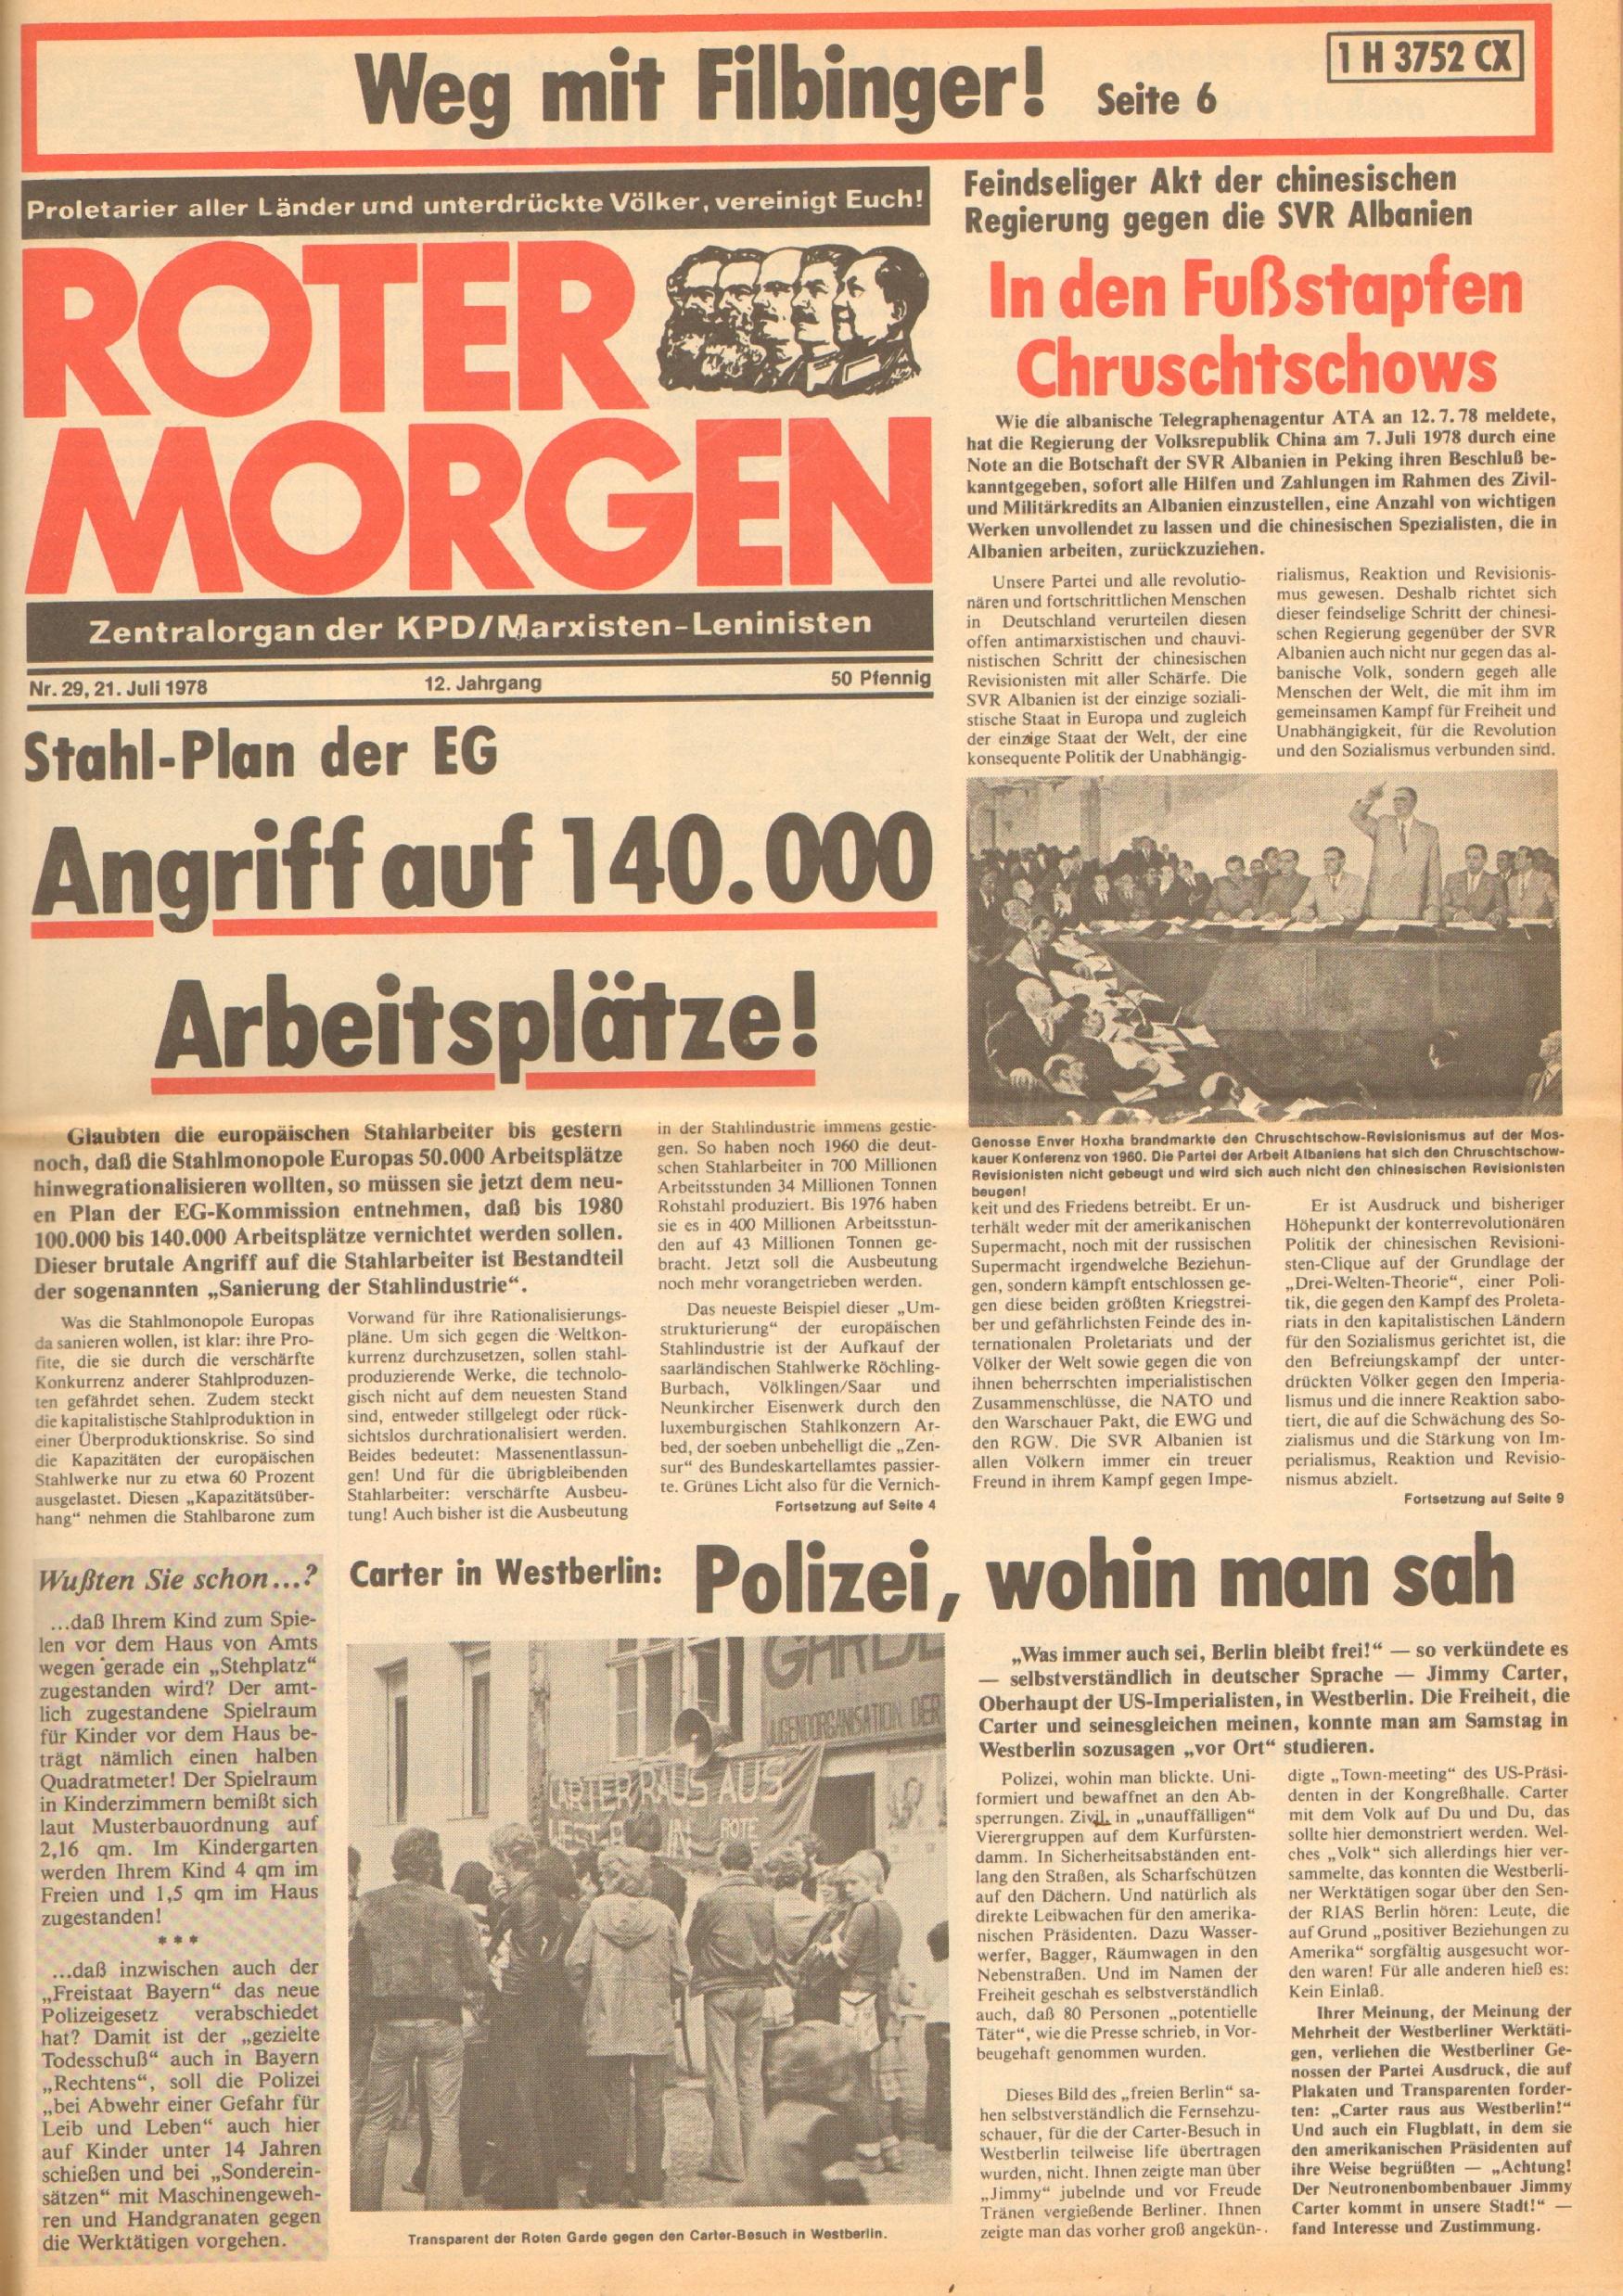 Roter Morgen, 12. Jg., 21. Juli 1978, Nr. 29, Seite 1